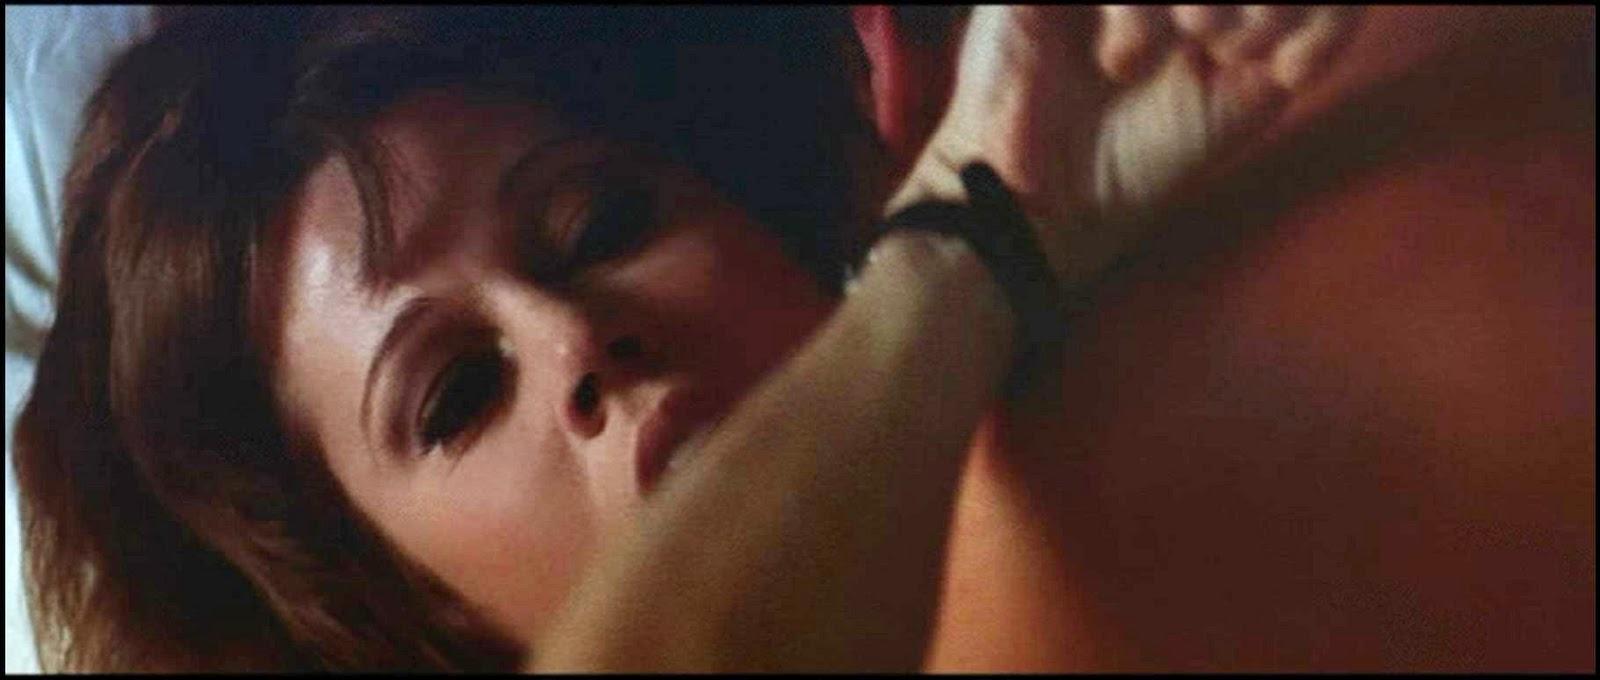 jane-fonda-naked-hot-watch-tamanna-sex-clip